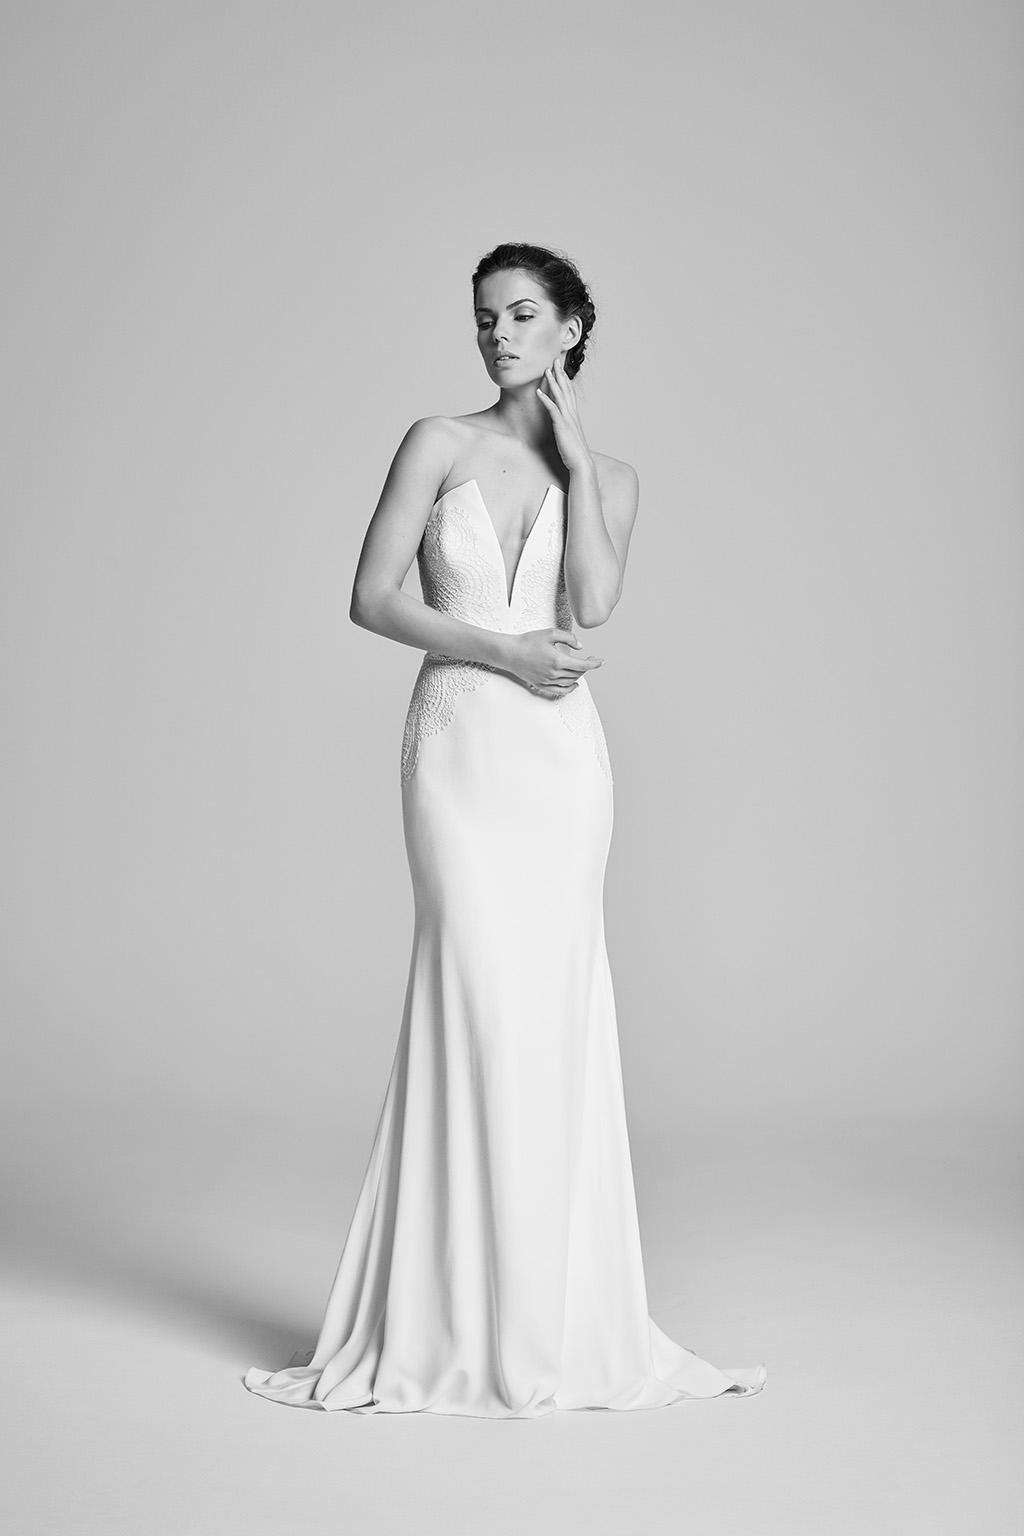 delphine-bridalcouture-wedding-dresses-uk-belle-epoque-collection-2018-by-designer-suzanne-neville